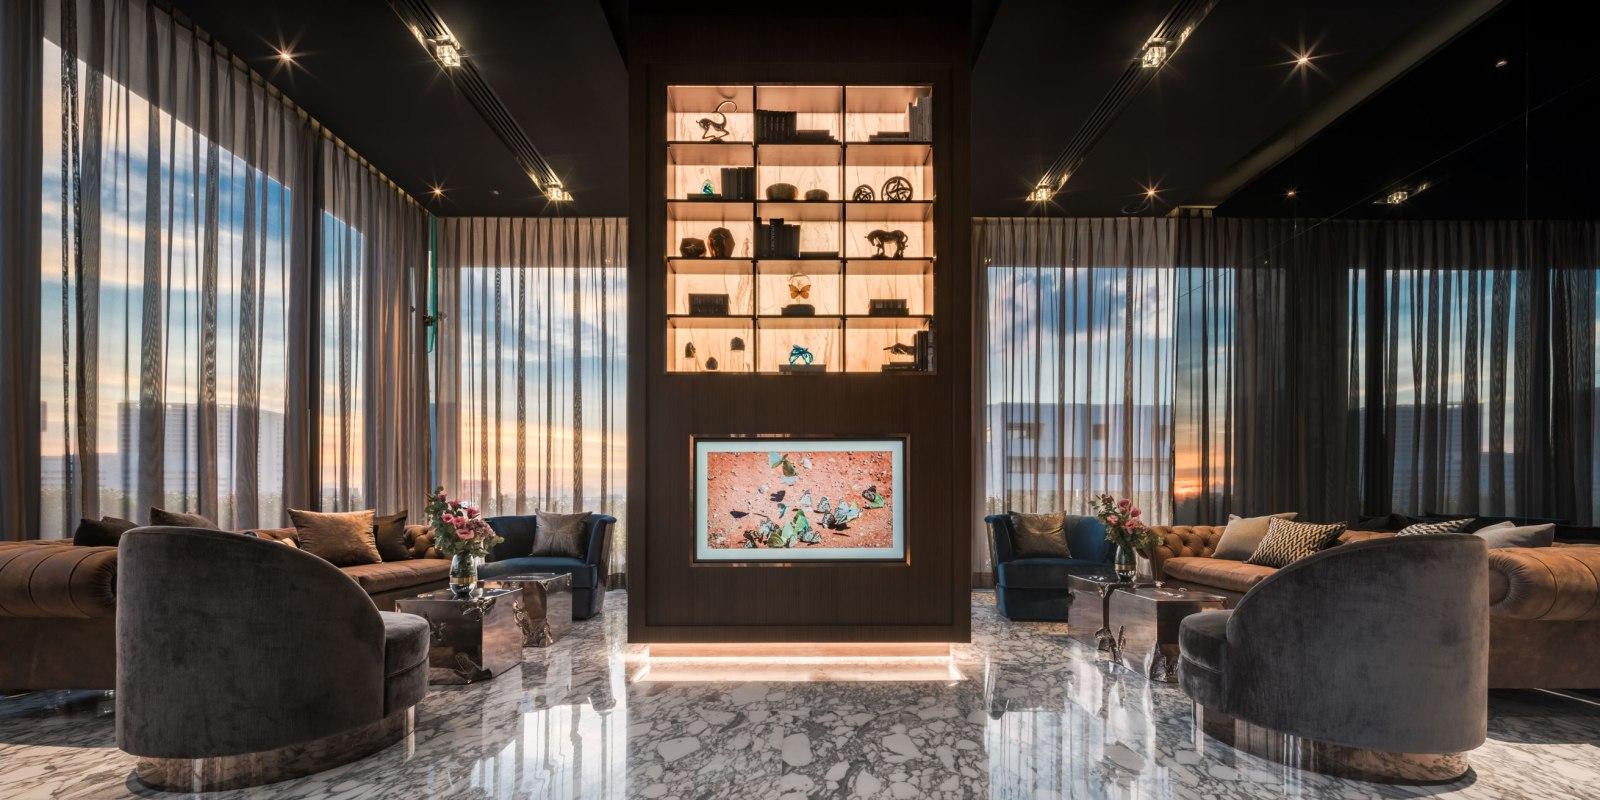 Phuket Real Estate Agency – Thailand – Bangkok – The Monument Sanampao (74)